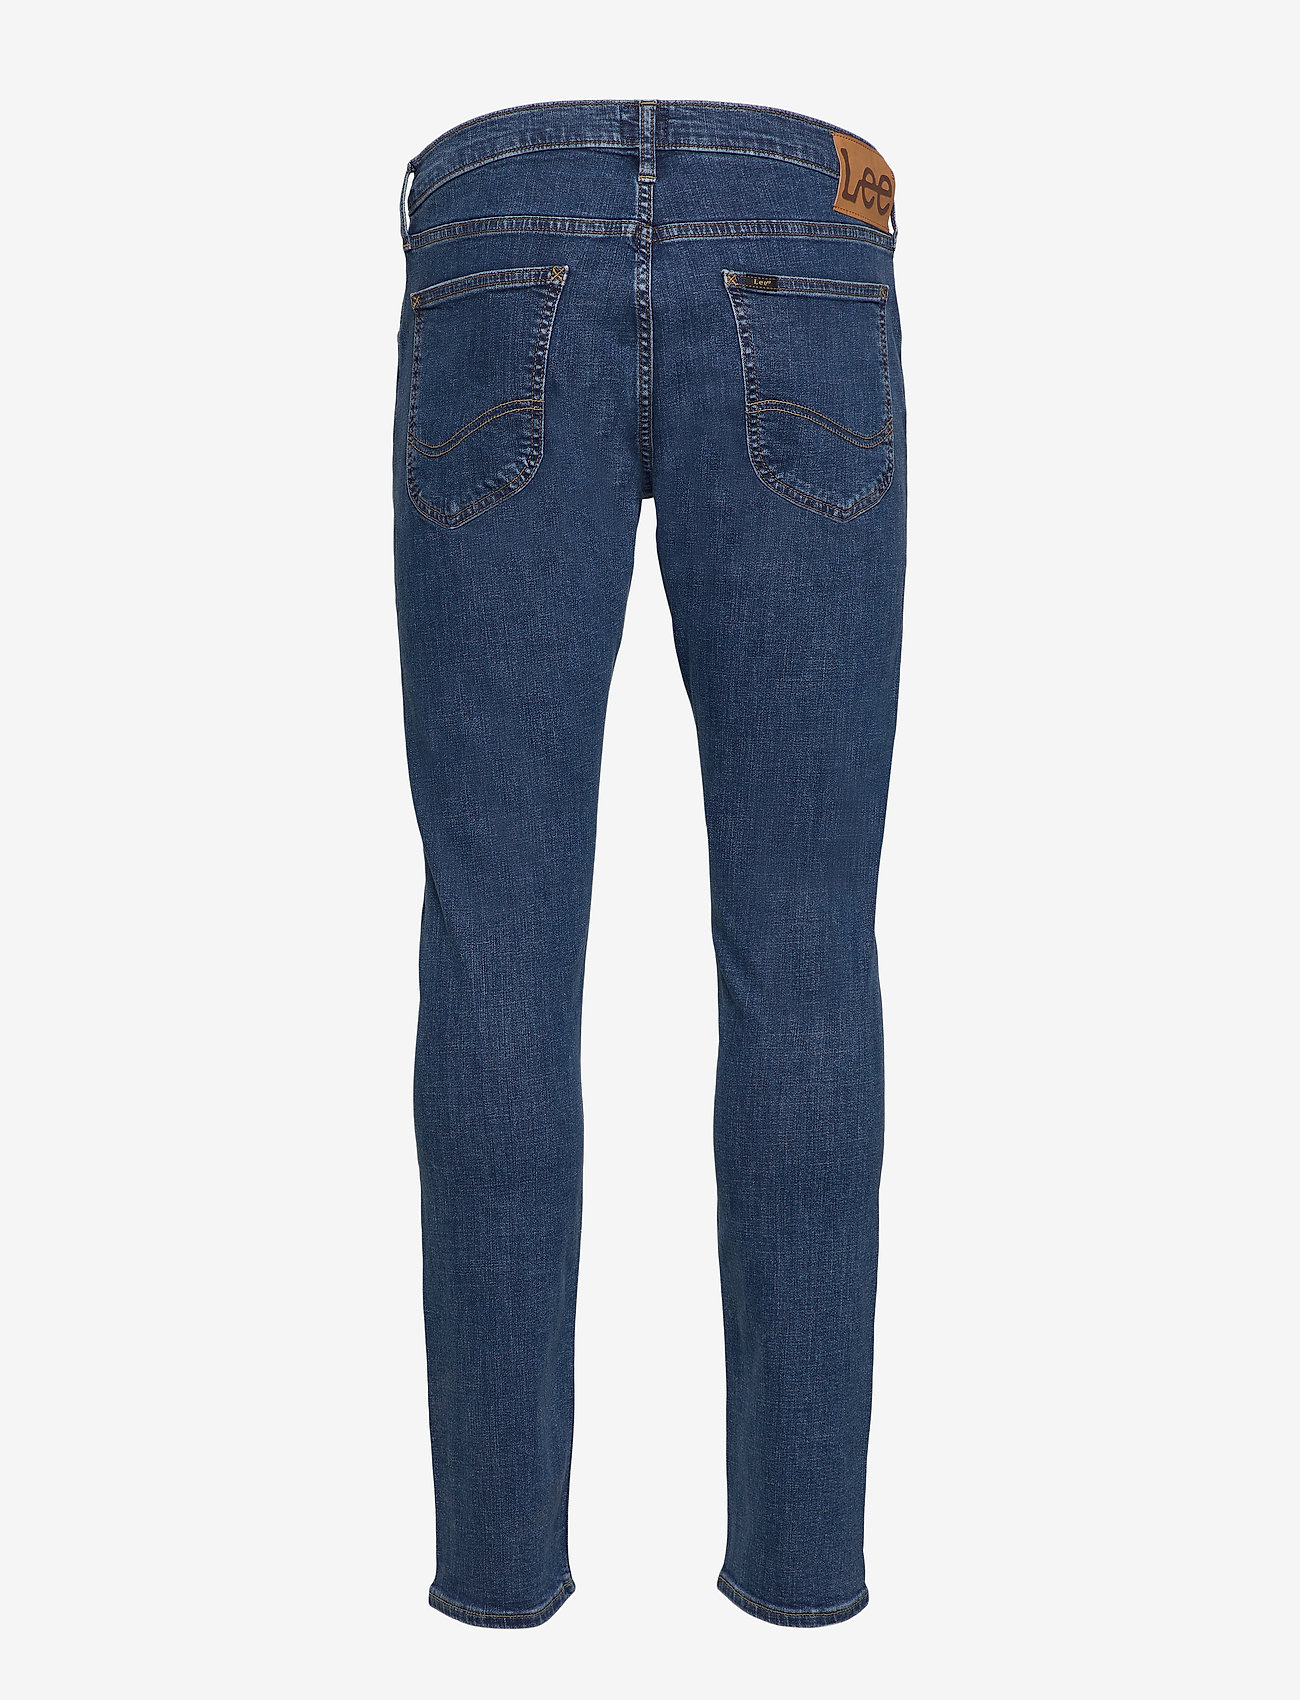 Lee Jeans - LUKE - regular jeans - used aquin - 1